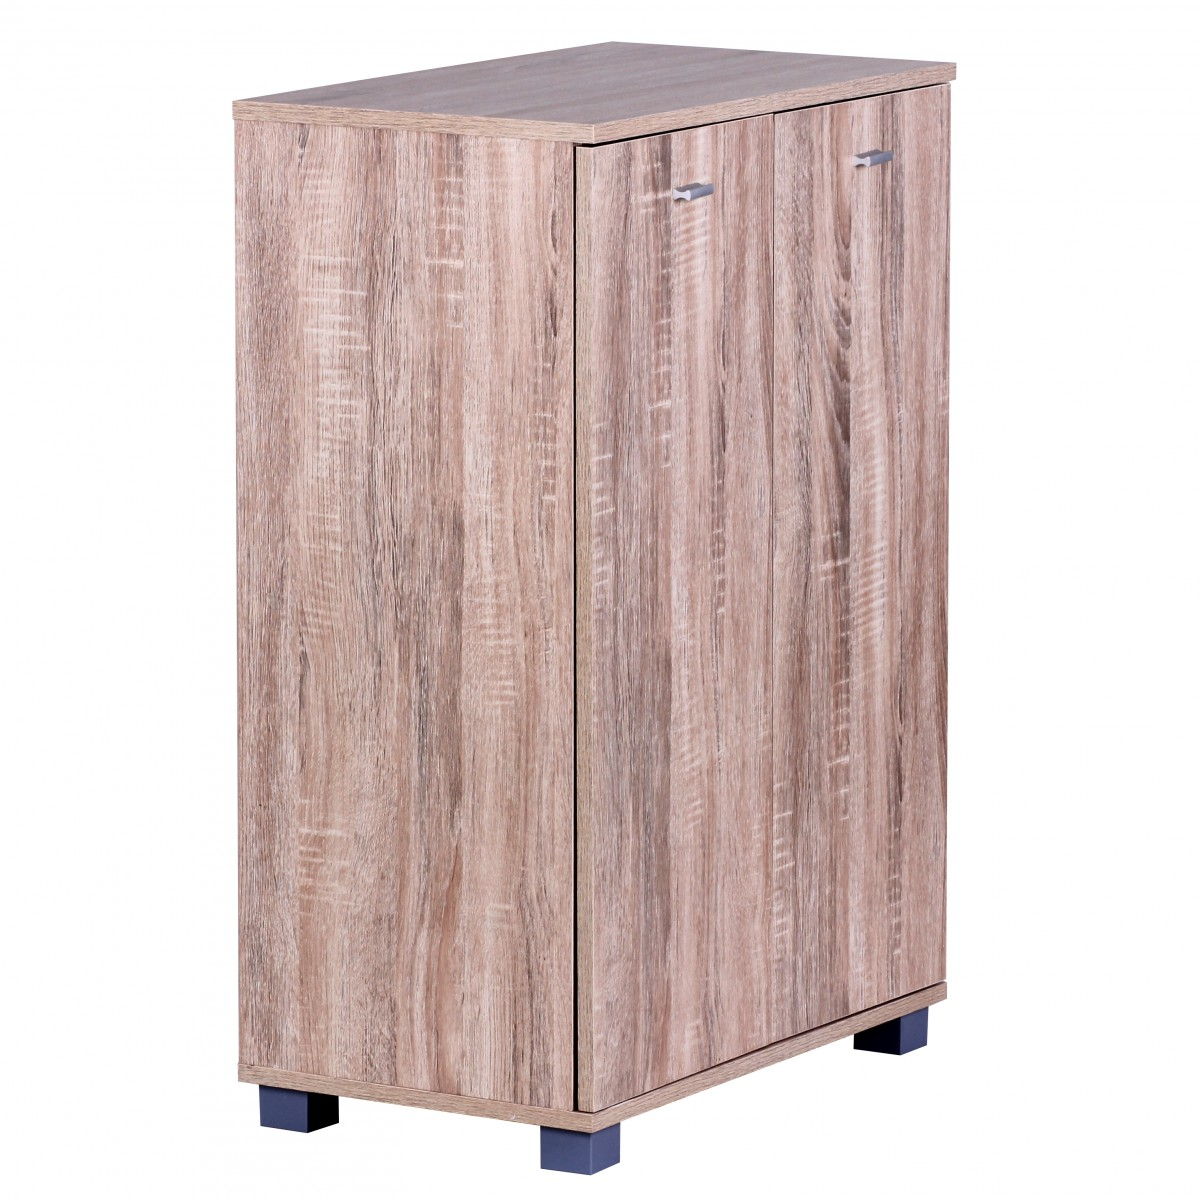 wohnling schuhschrank 2 t rig 60 x 90 x 35 cm sonoma 12 paar schuhe 38333. Black Bedroom Furniture Sets. Home Design Ideas